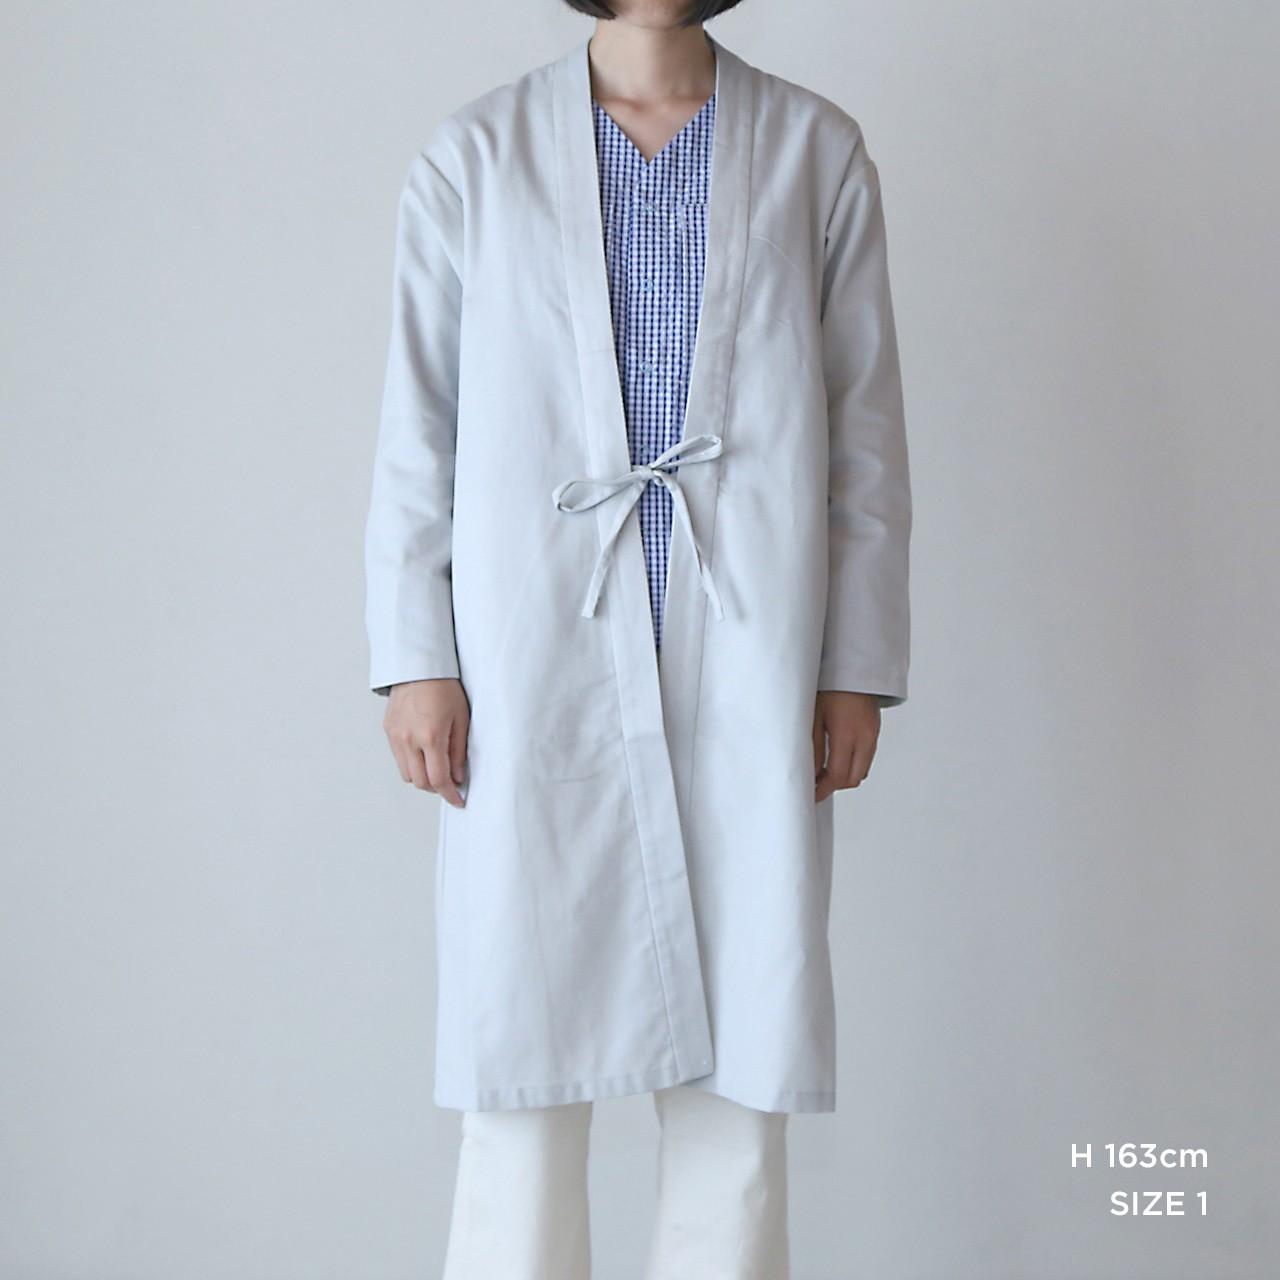 CO-12 伊達羽織長丈 変わり織 銀鼠●